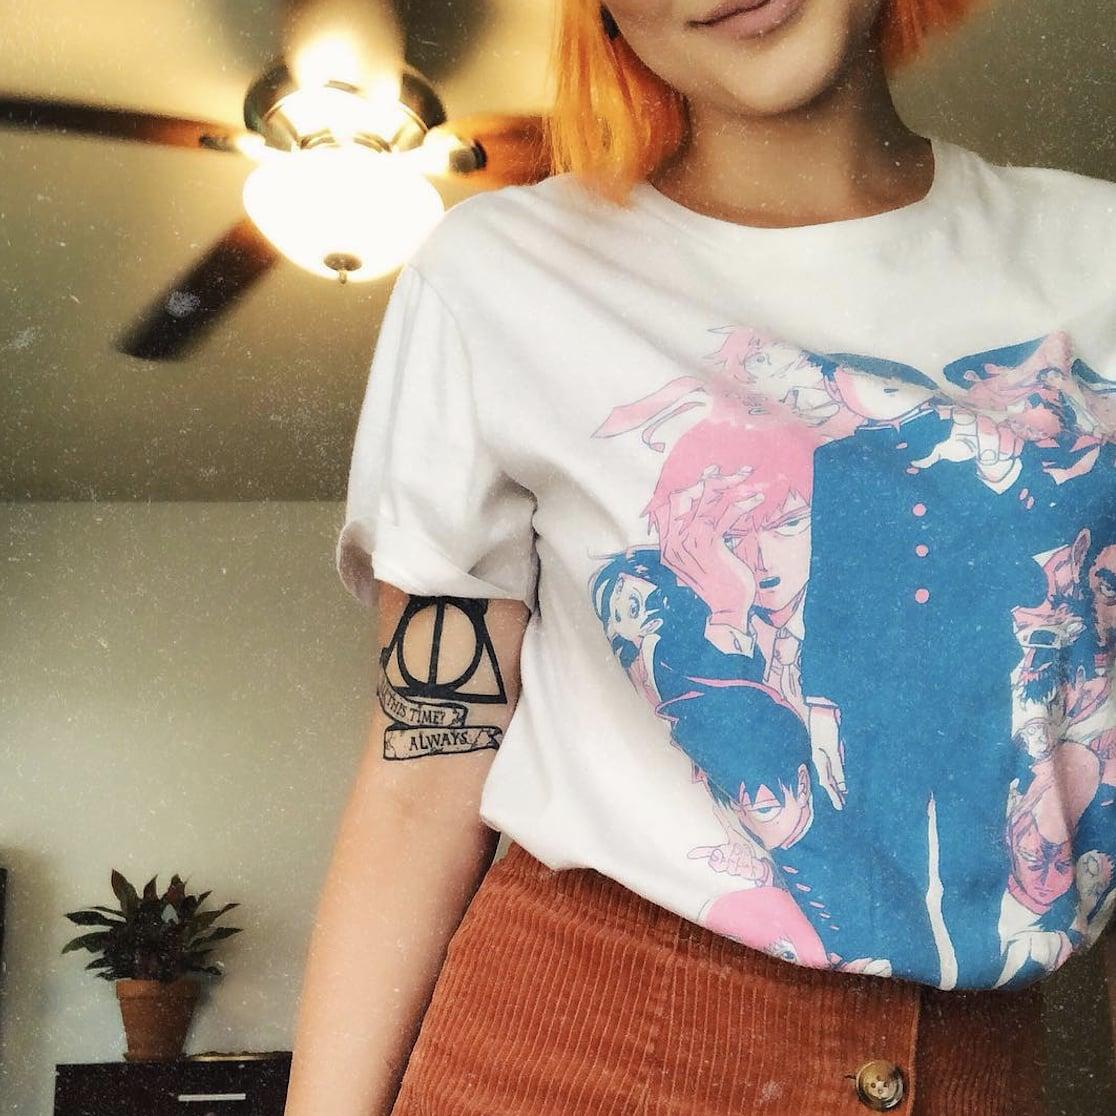 The Best Harry Potter Tattoo Ideas   POPSUGAR Tech